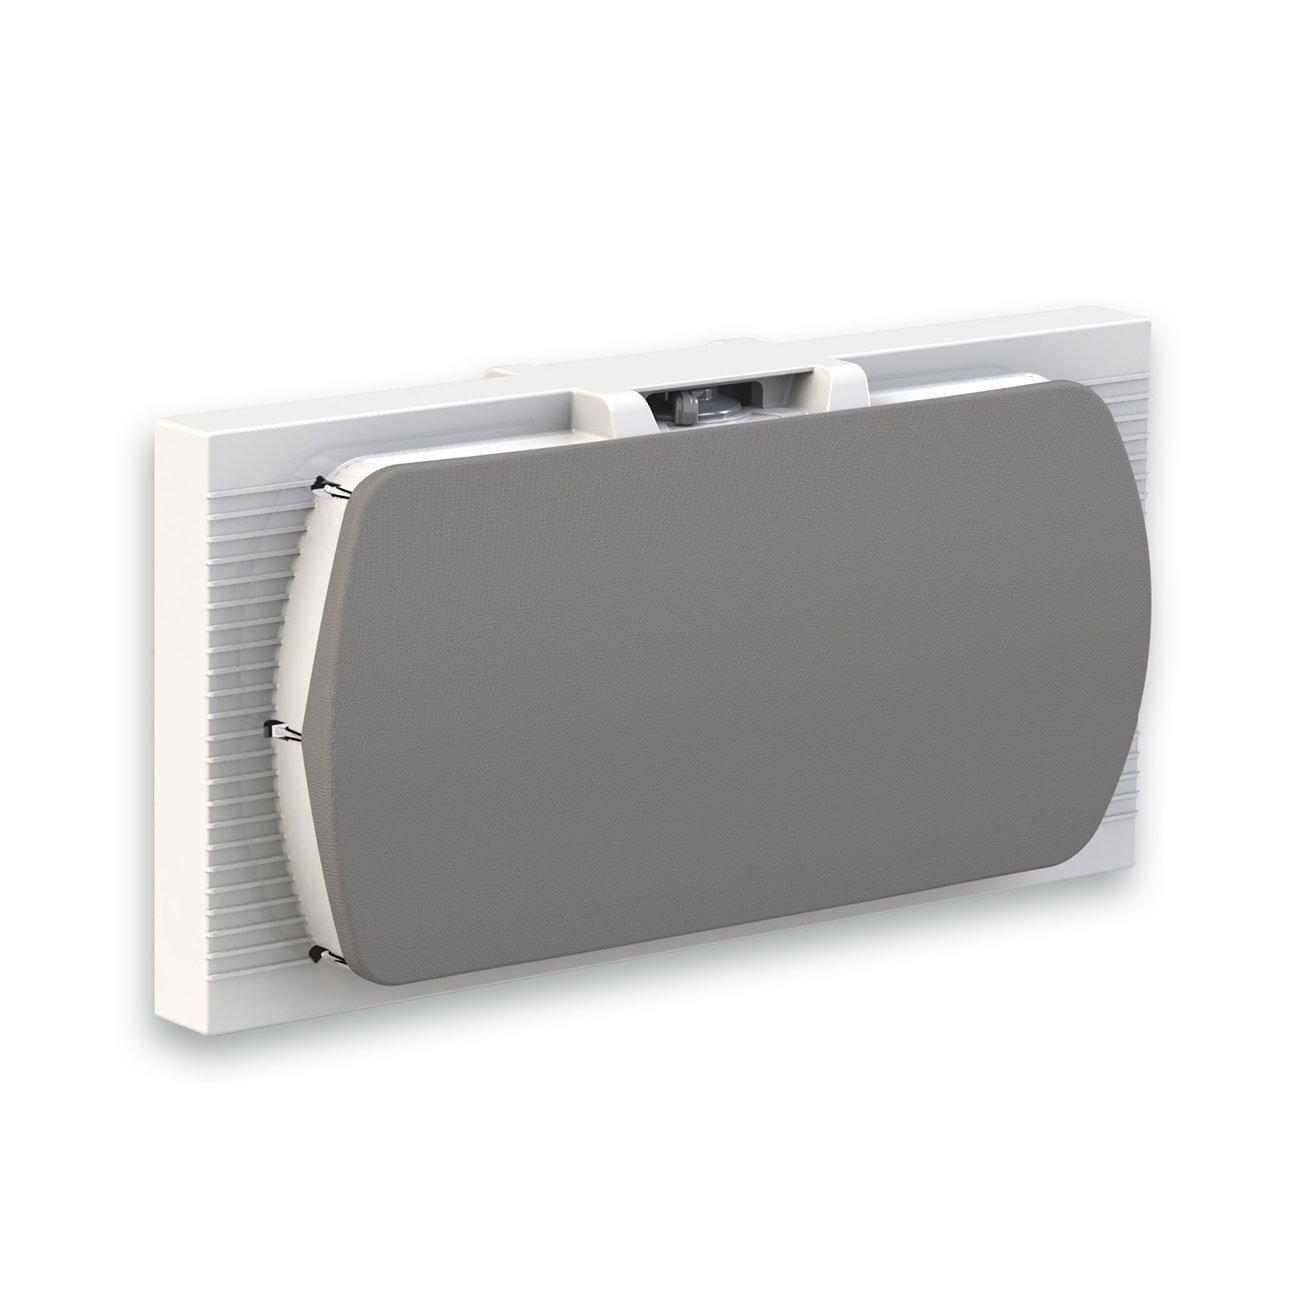 HowPlumb Dual Blade 9-Inch Twin Window Fan with Cover Portable, White by HowPlumb